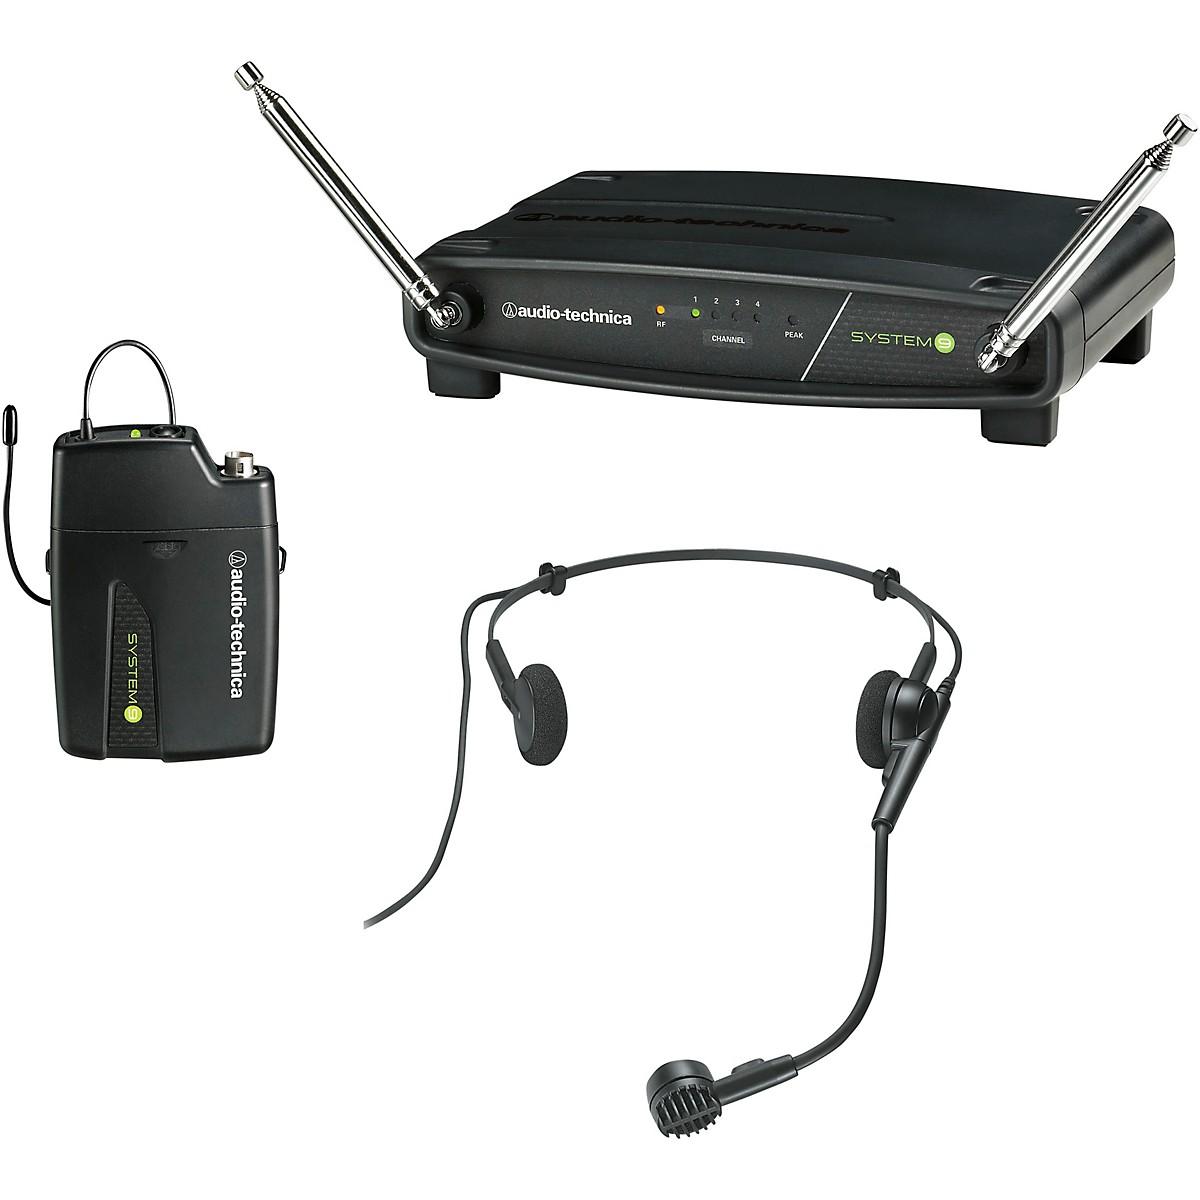 Audio-Technica ATW-901a/H System 9 Headworn Wireless System